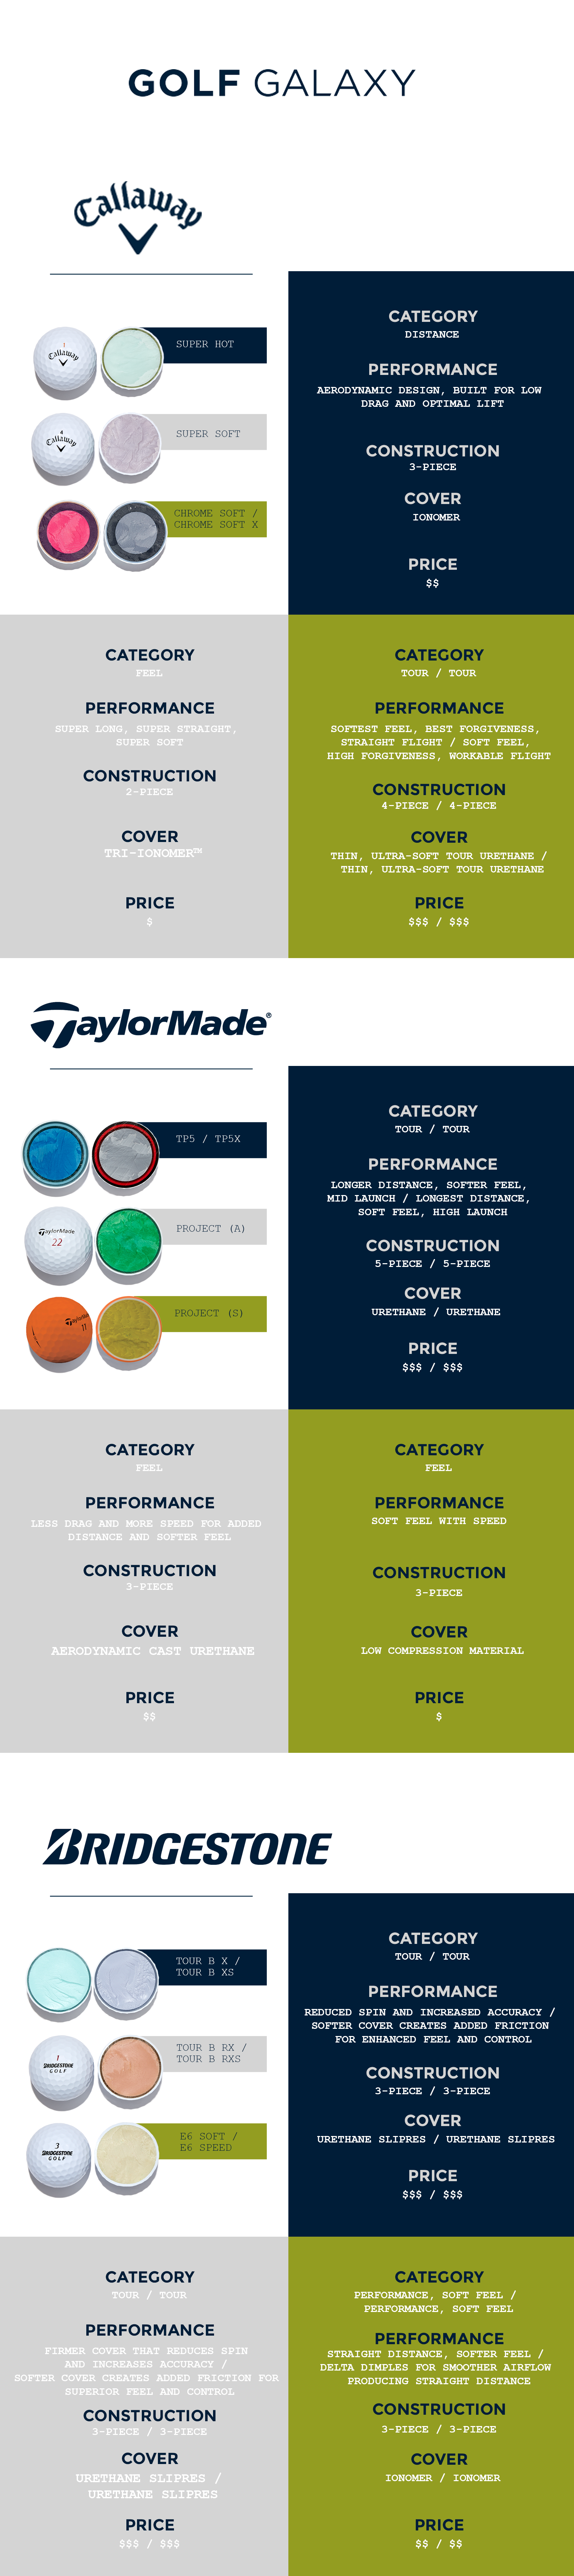 Golf Ball Buying Guide Golf Galaxy Golf Ball Golf Ball Crafts Golf